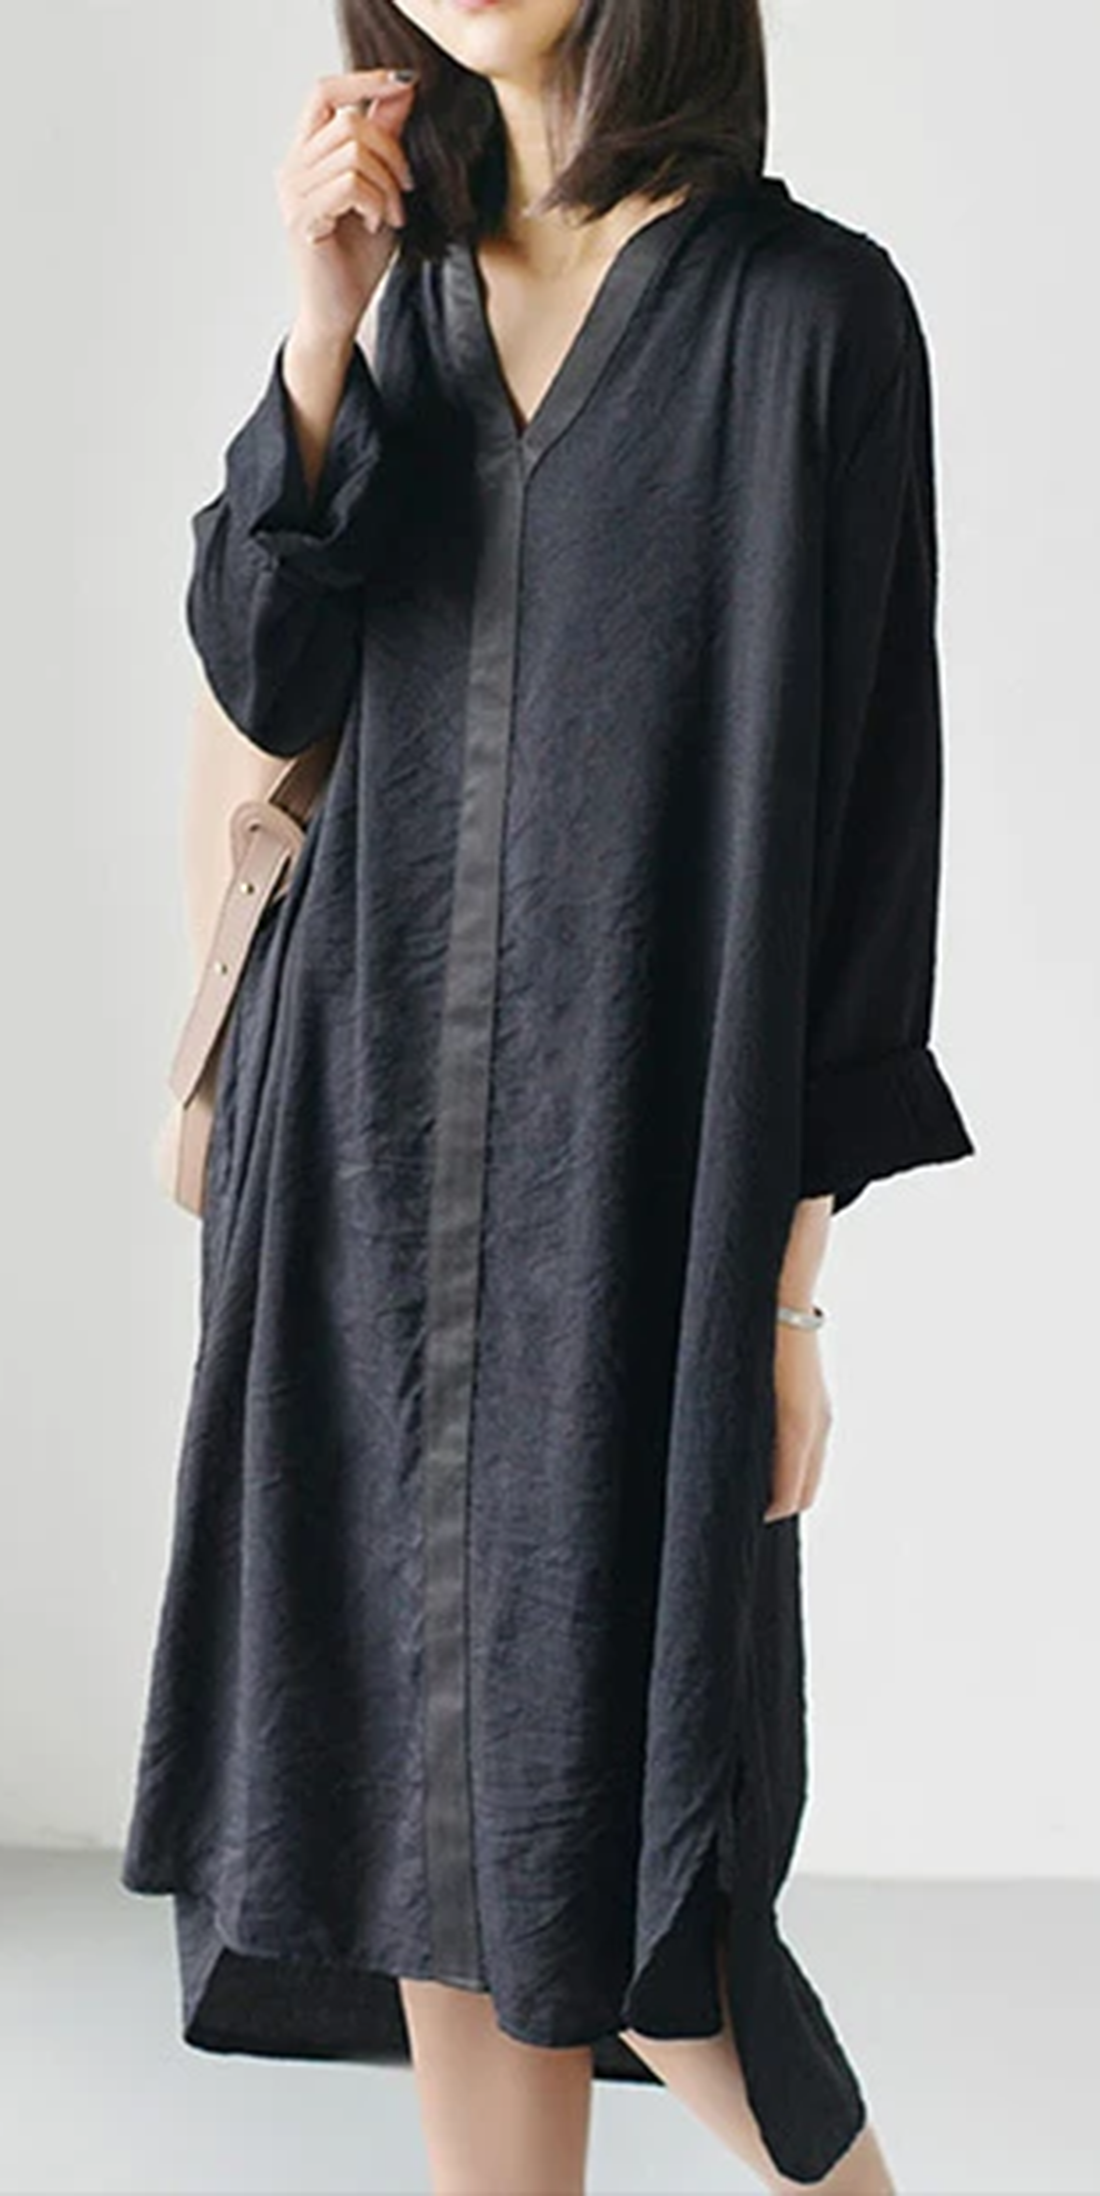 Black Causal Flowy Summer Dress Long Sleeve Shift Dresses Oversize Clothing Flowy Summer Dresses Long Sleeve Summer Dress Long Sleeve Dress [ 2196 x 1100 Pixel ]